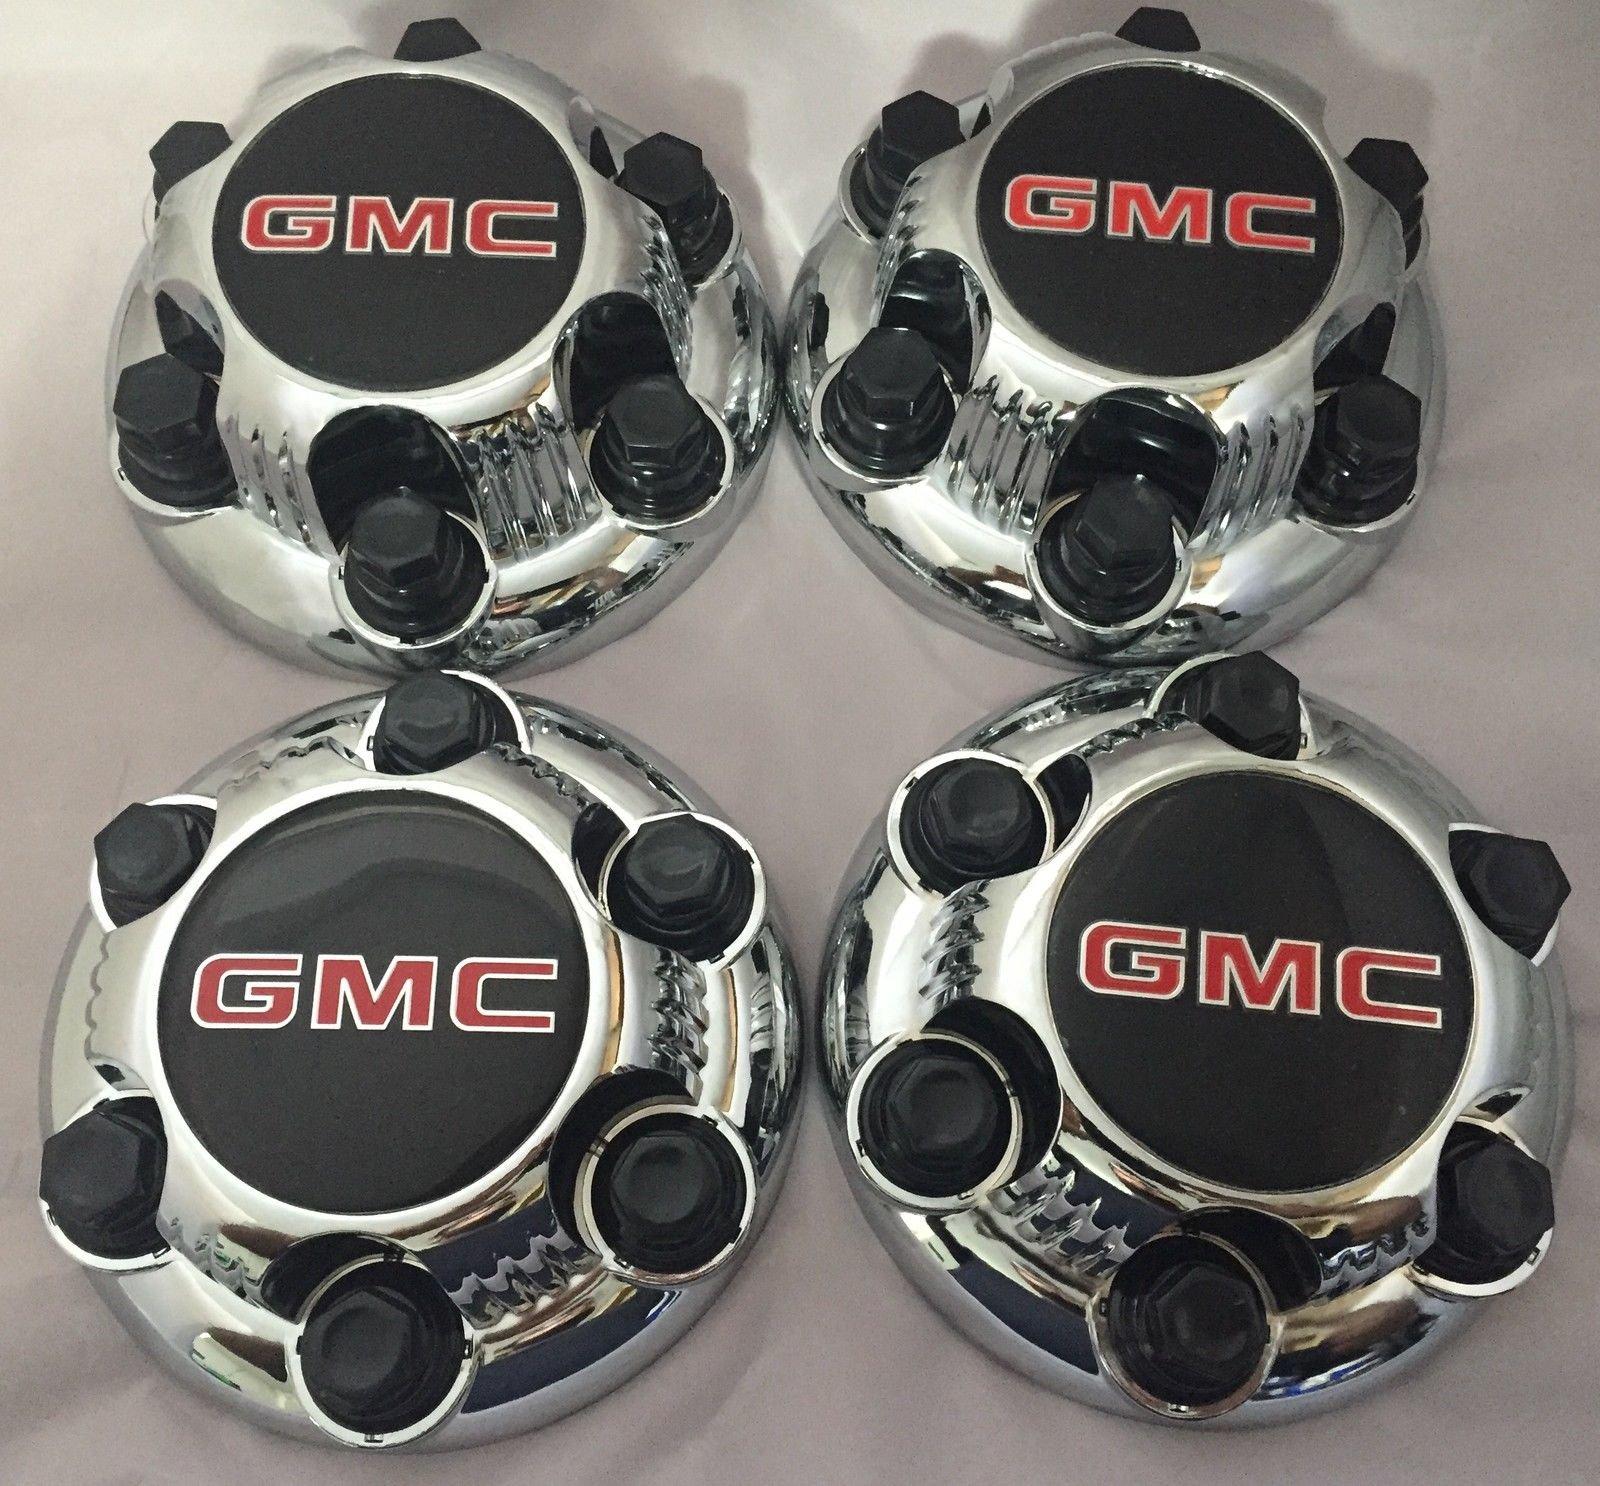 REPLACEMENT PART: Set of 4 Chrome GMC Sierra Yukon Savana 6 Lug 1500 Center Caps 16'' 17'' Wheels